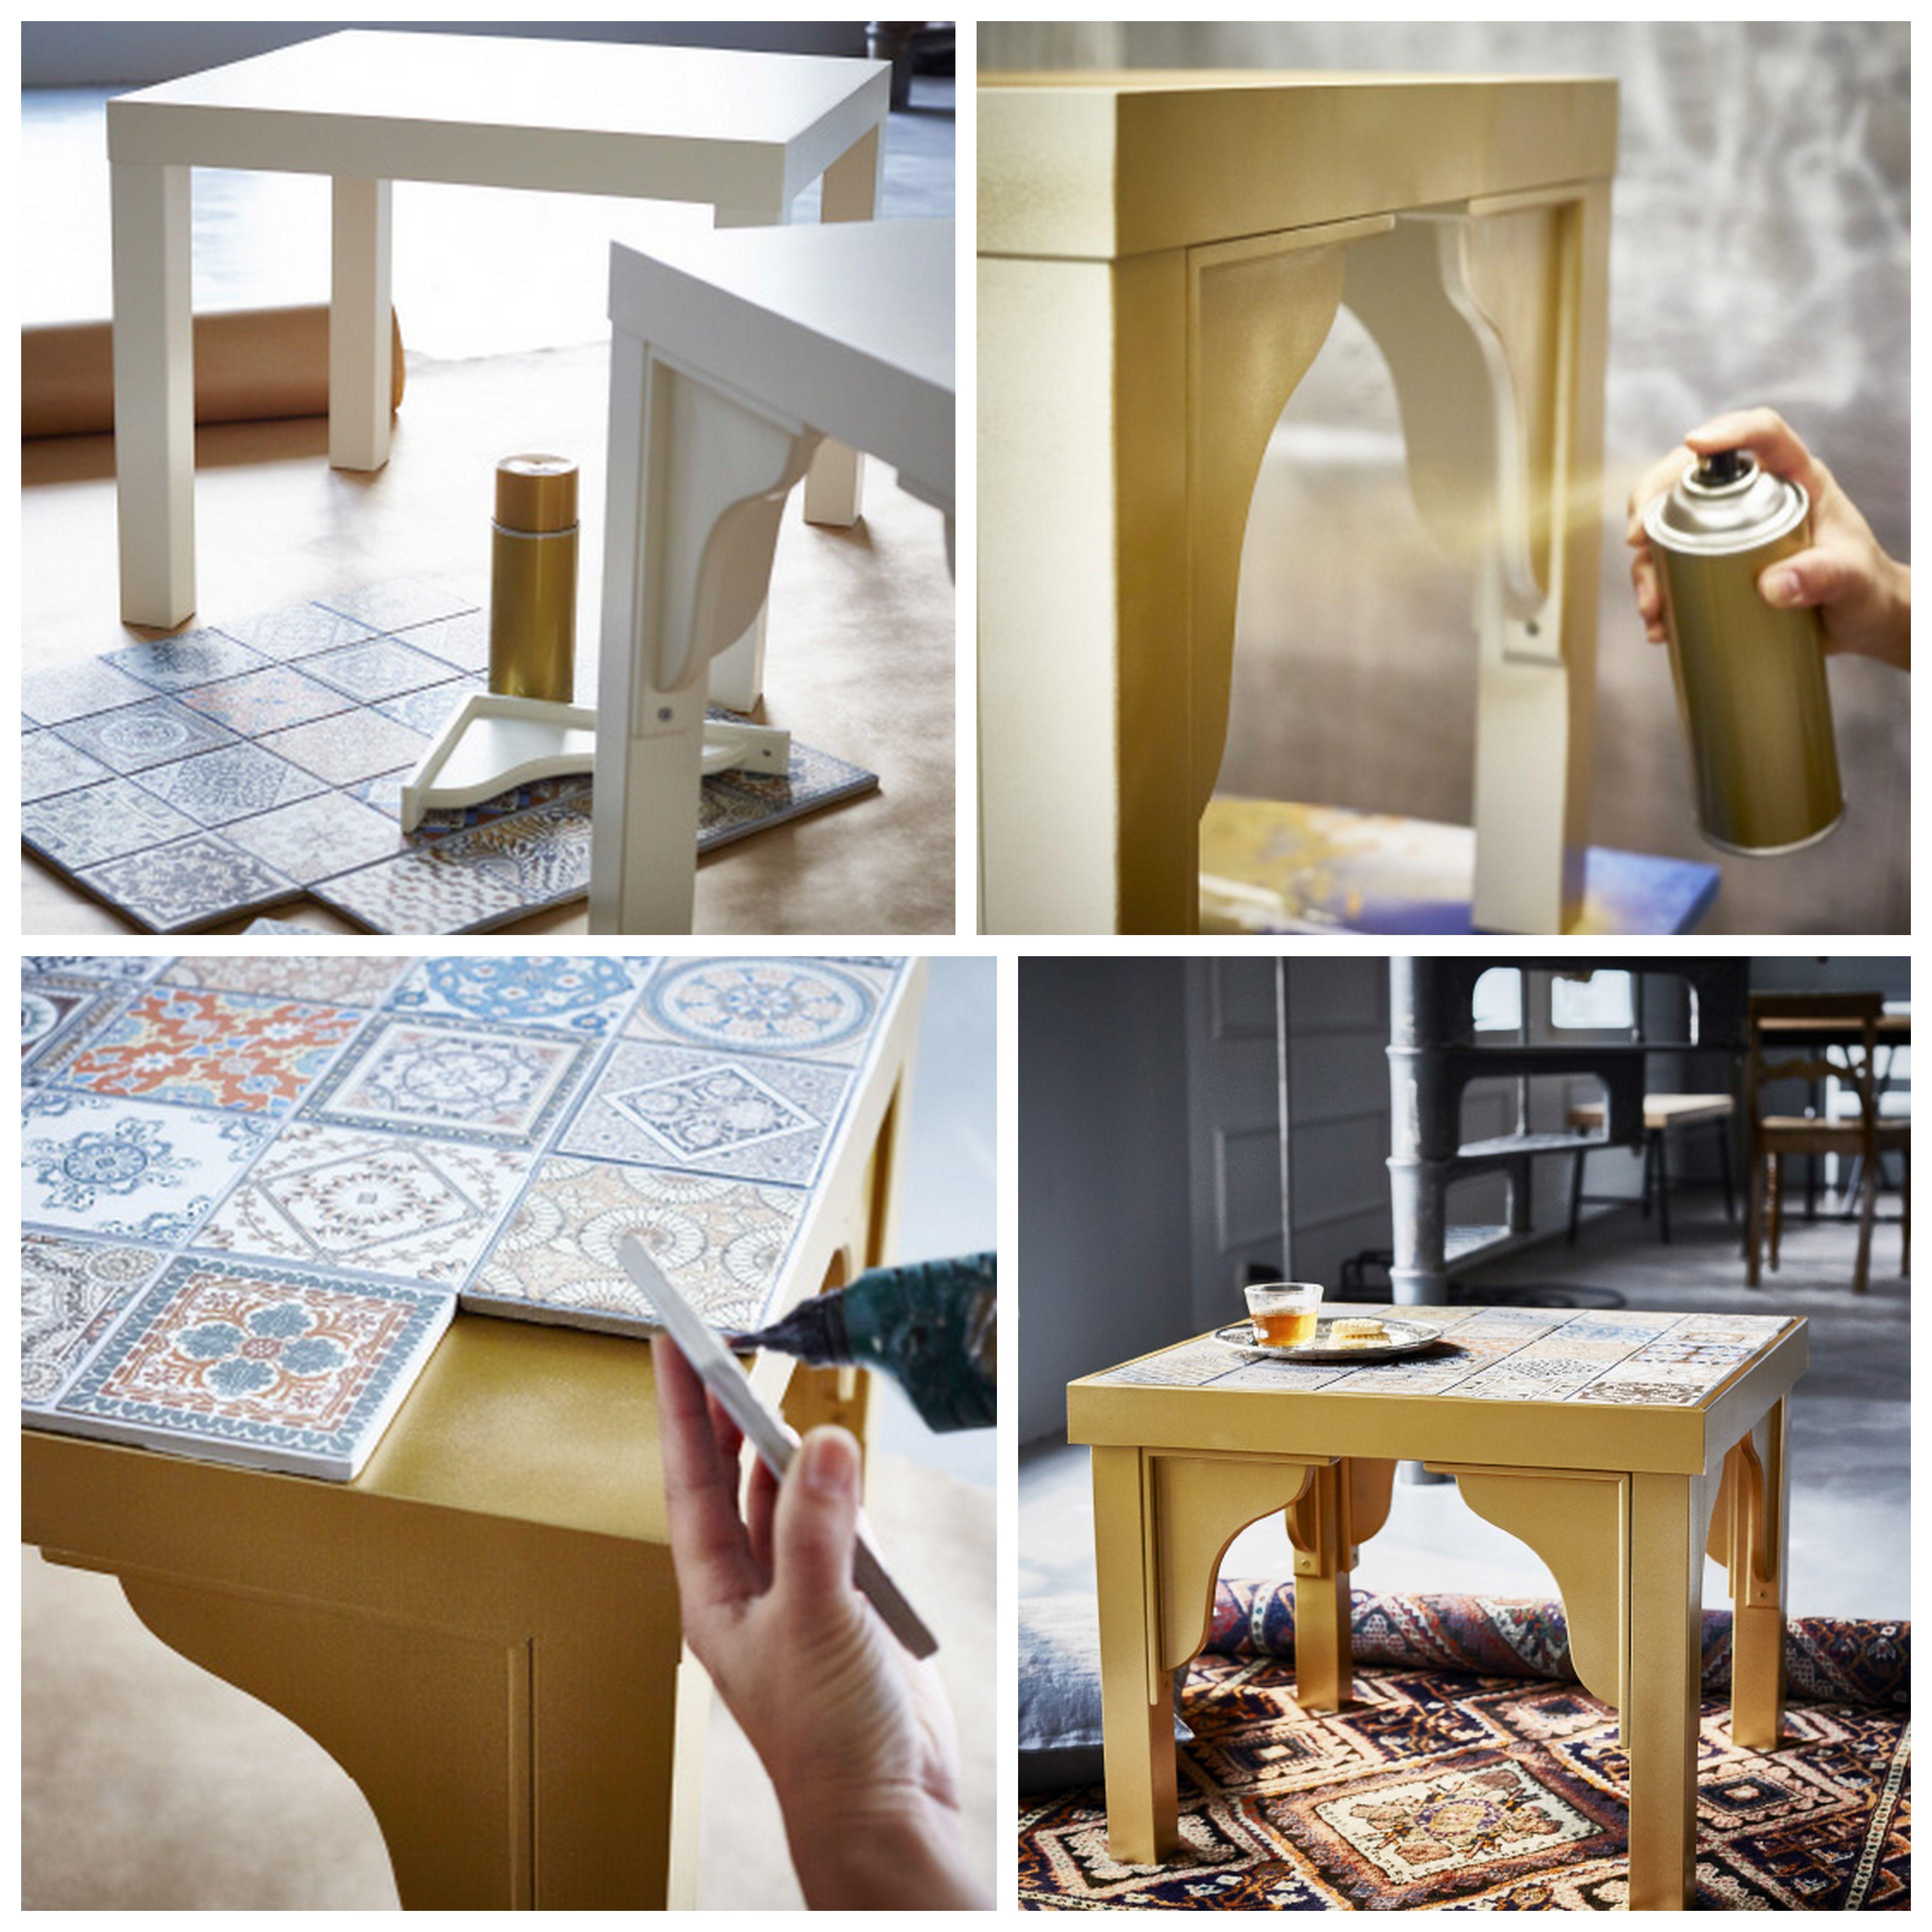 diy ikea lack coffee table hack pinteres. Black Bedroom Furniture Sets. Home Design Ideas